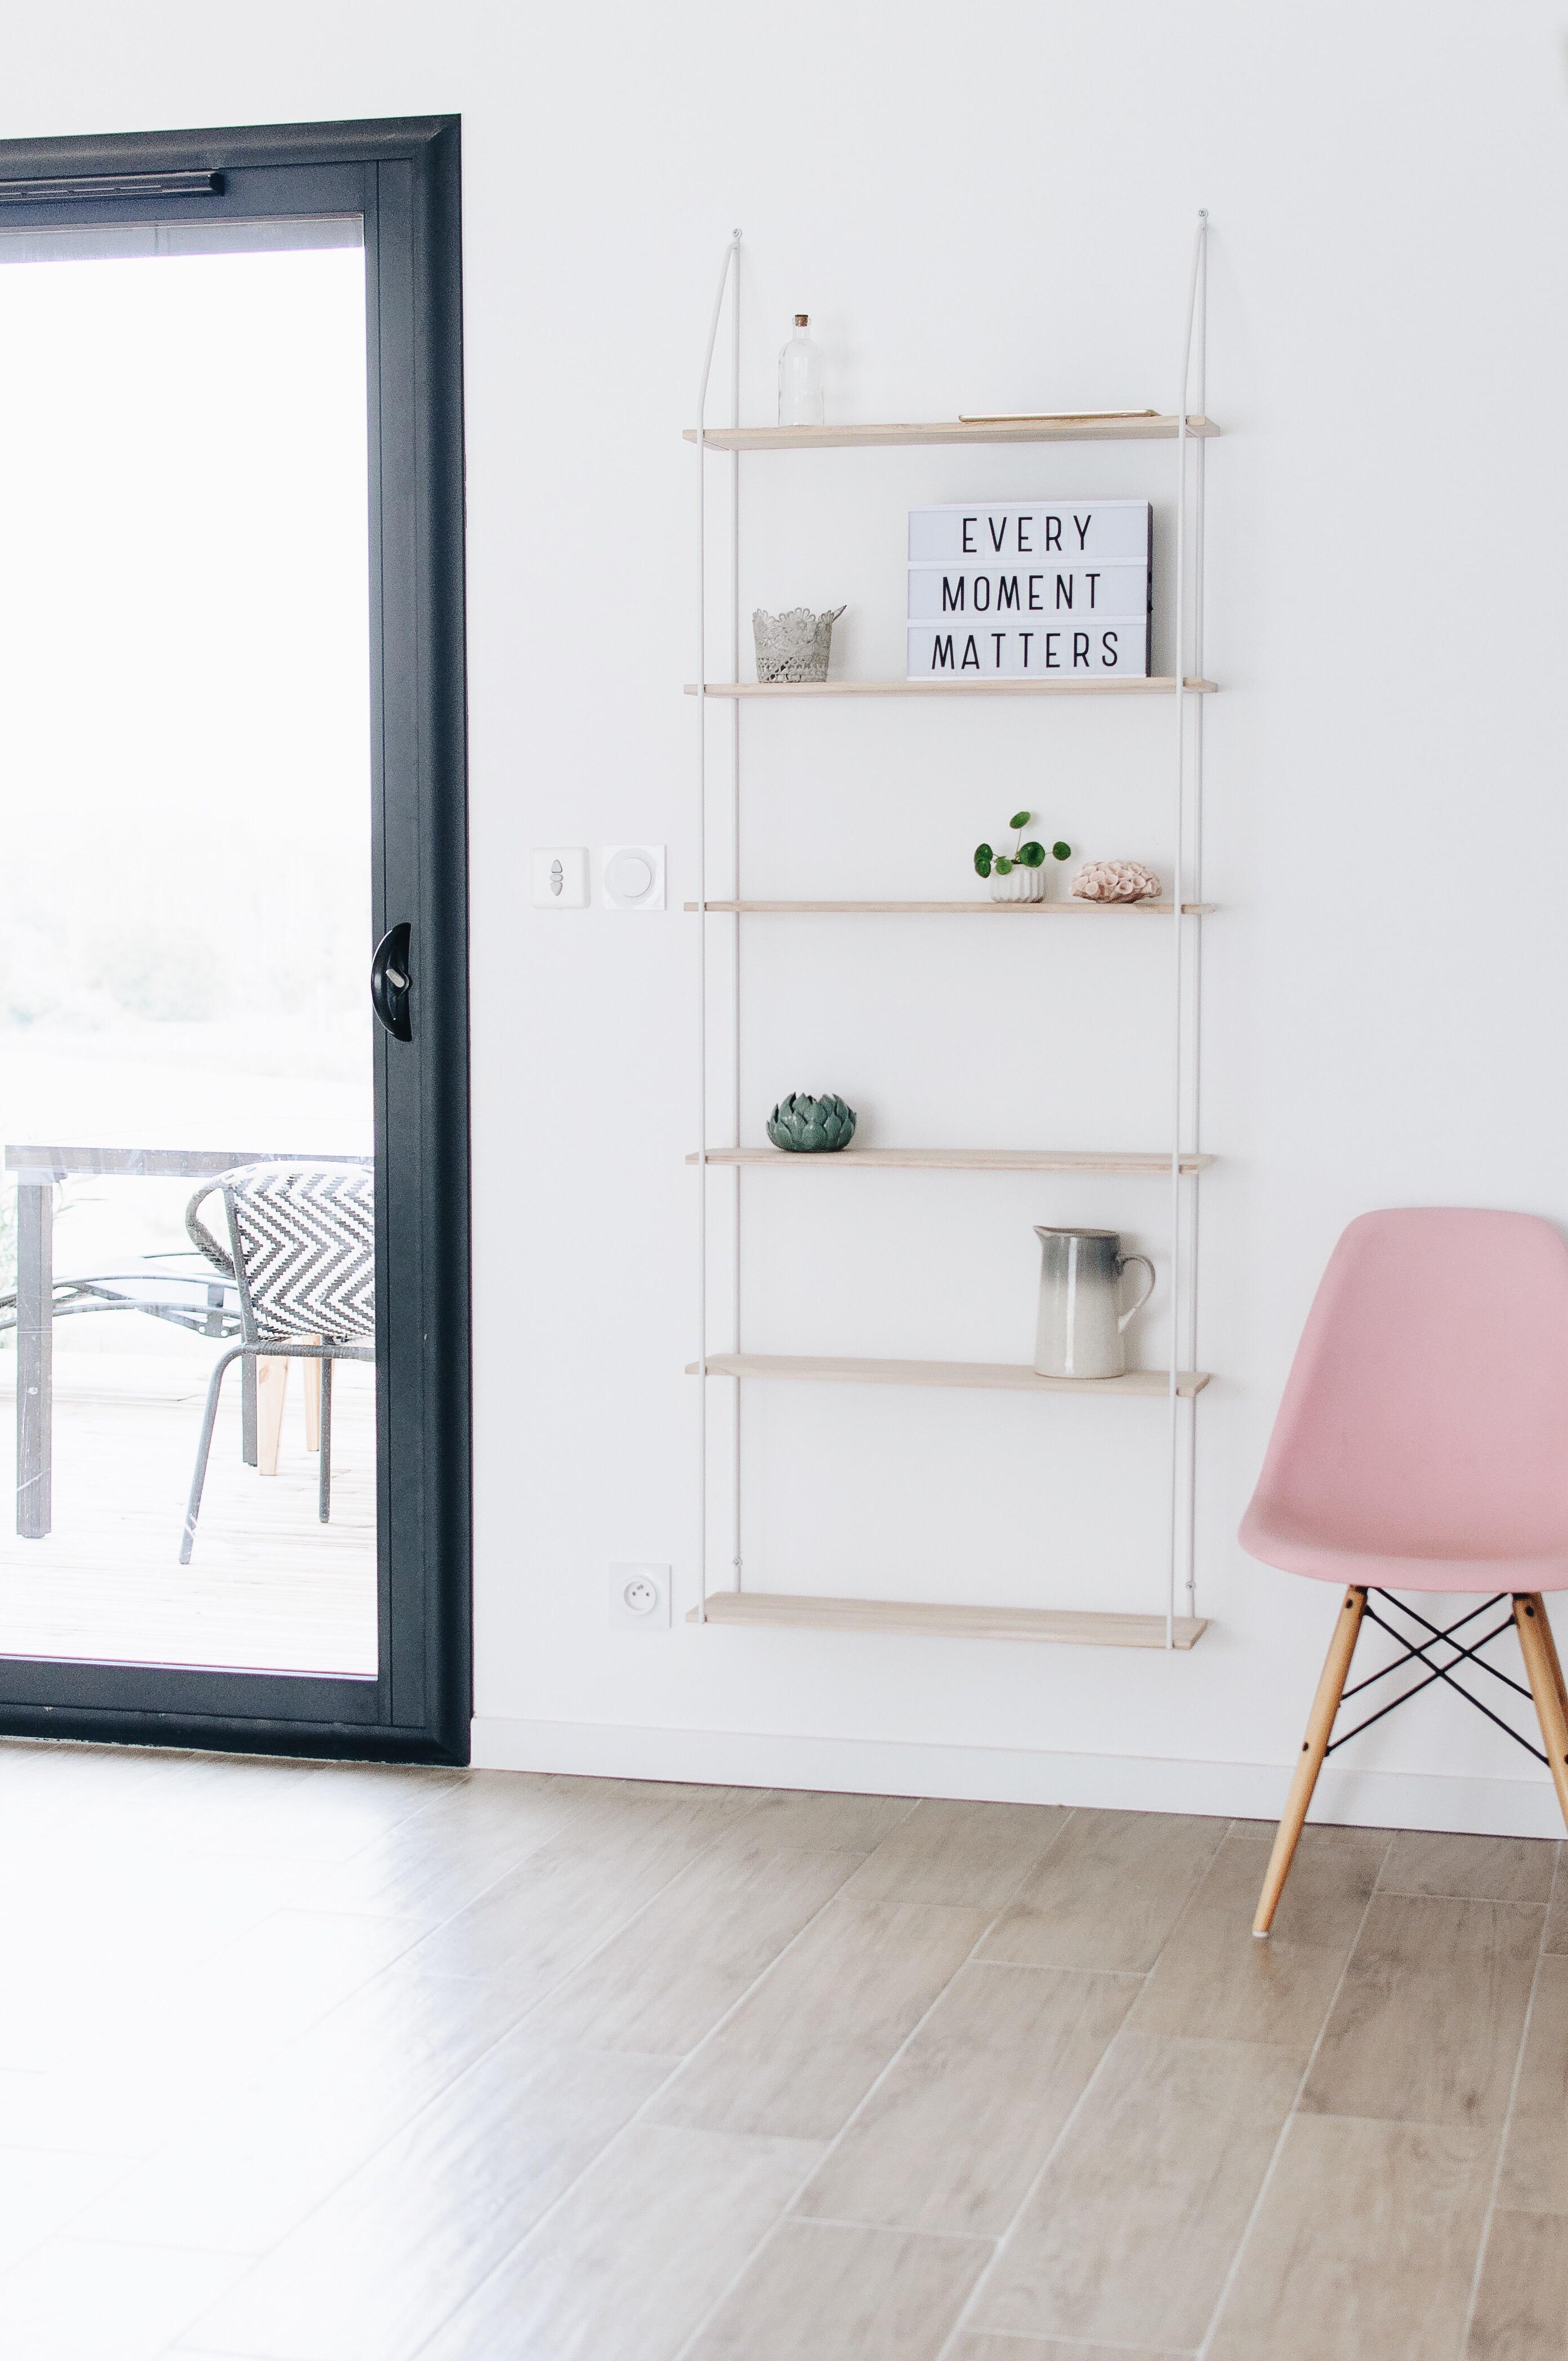 d couverte de sostrene grene j 39 ai d valis lifestyle mode d co maman diy. Black Bedroom Furniture Sets. Home Design Ideas